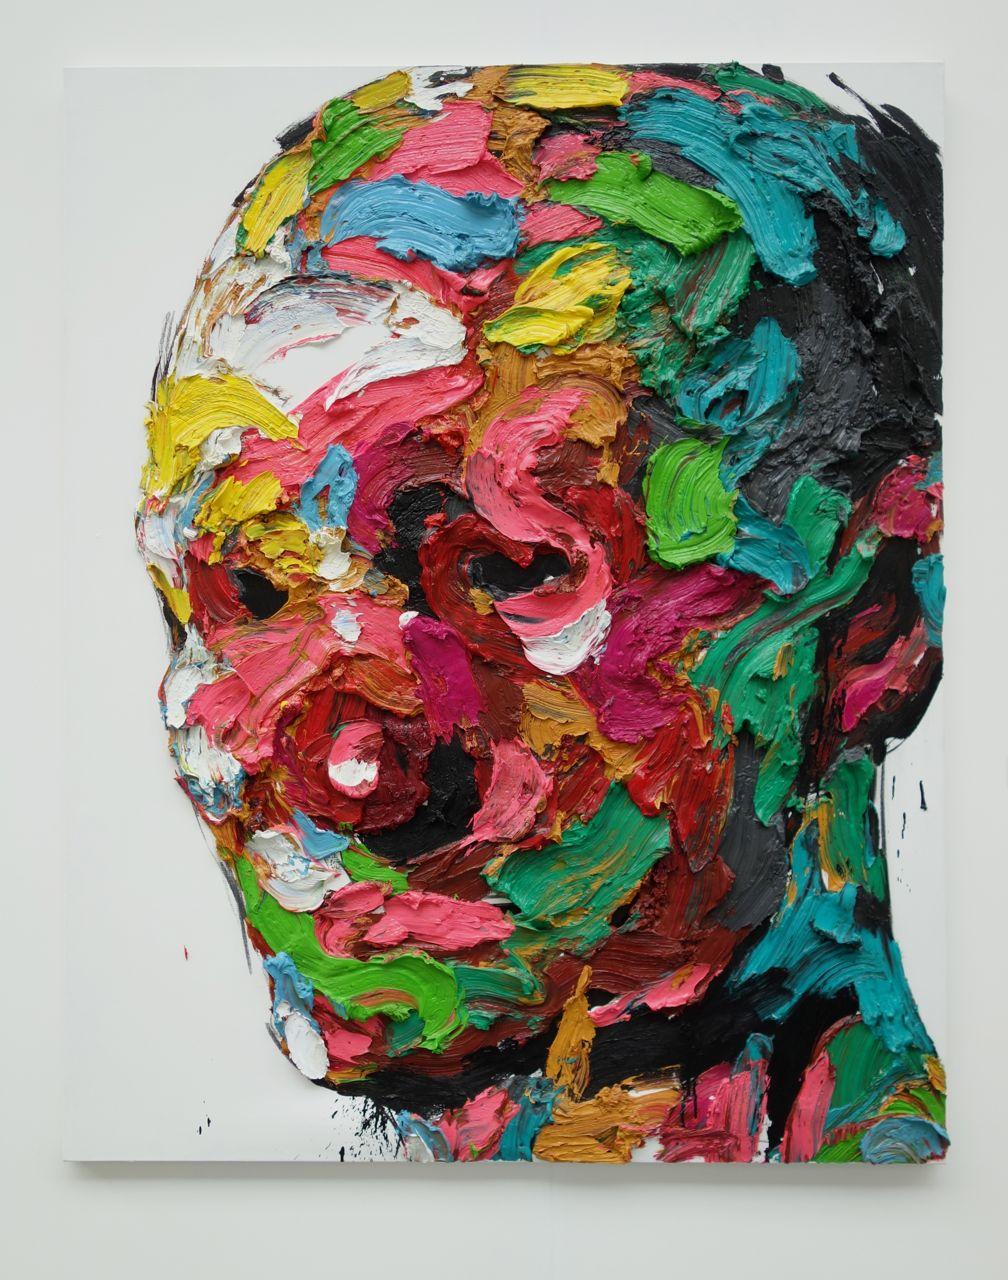 KwangHo Shin, 'Untitled #14P66', 2014, Oil on canvas, 162 x 130 cm, Unix Gallery (USA)